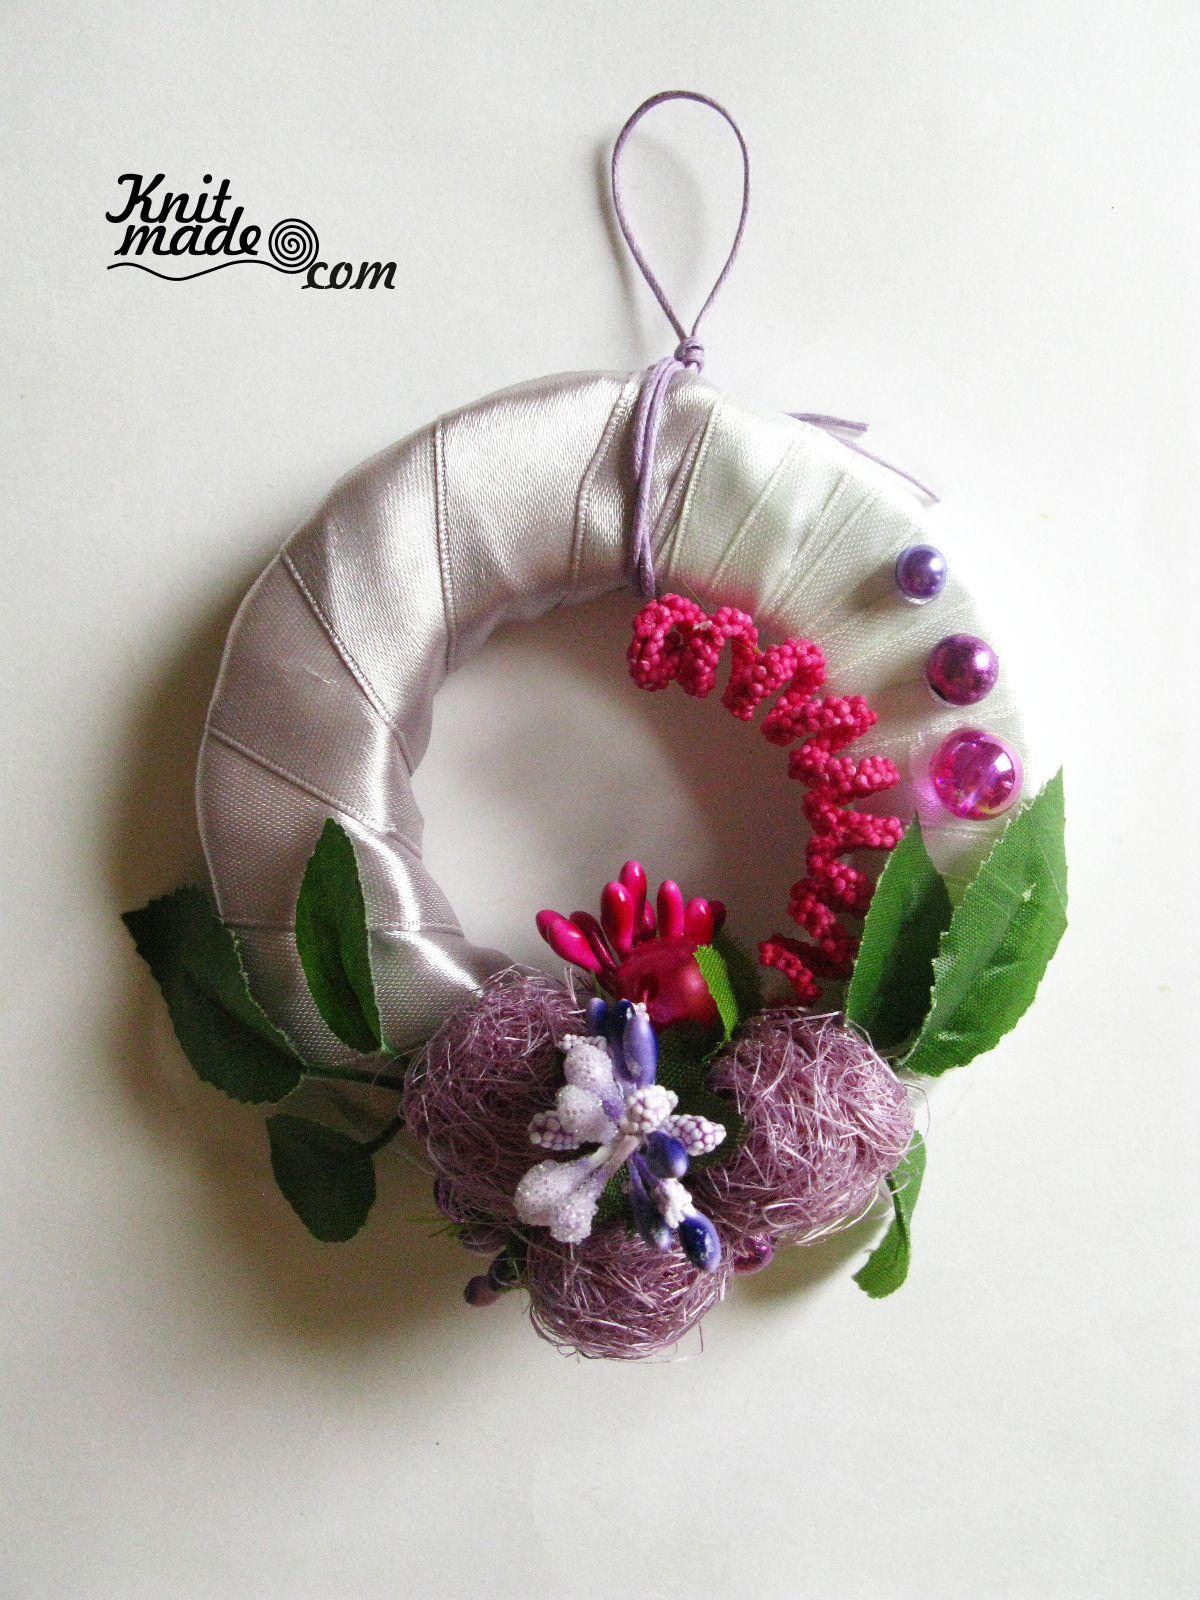 My florist work - Mini wreath from tapes  and decor  #knitmade #knitmadeflowers #knitmadenews #wreath #newyear #christmas